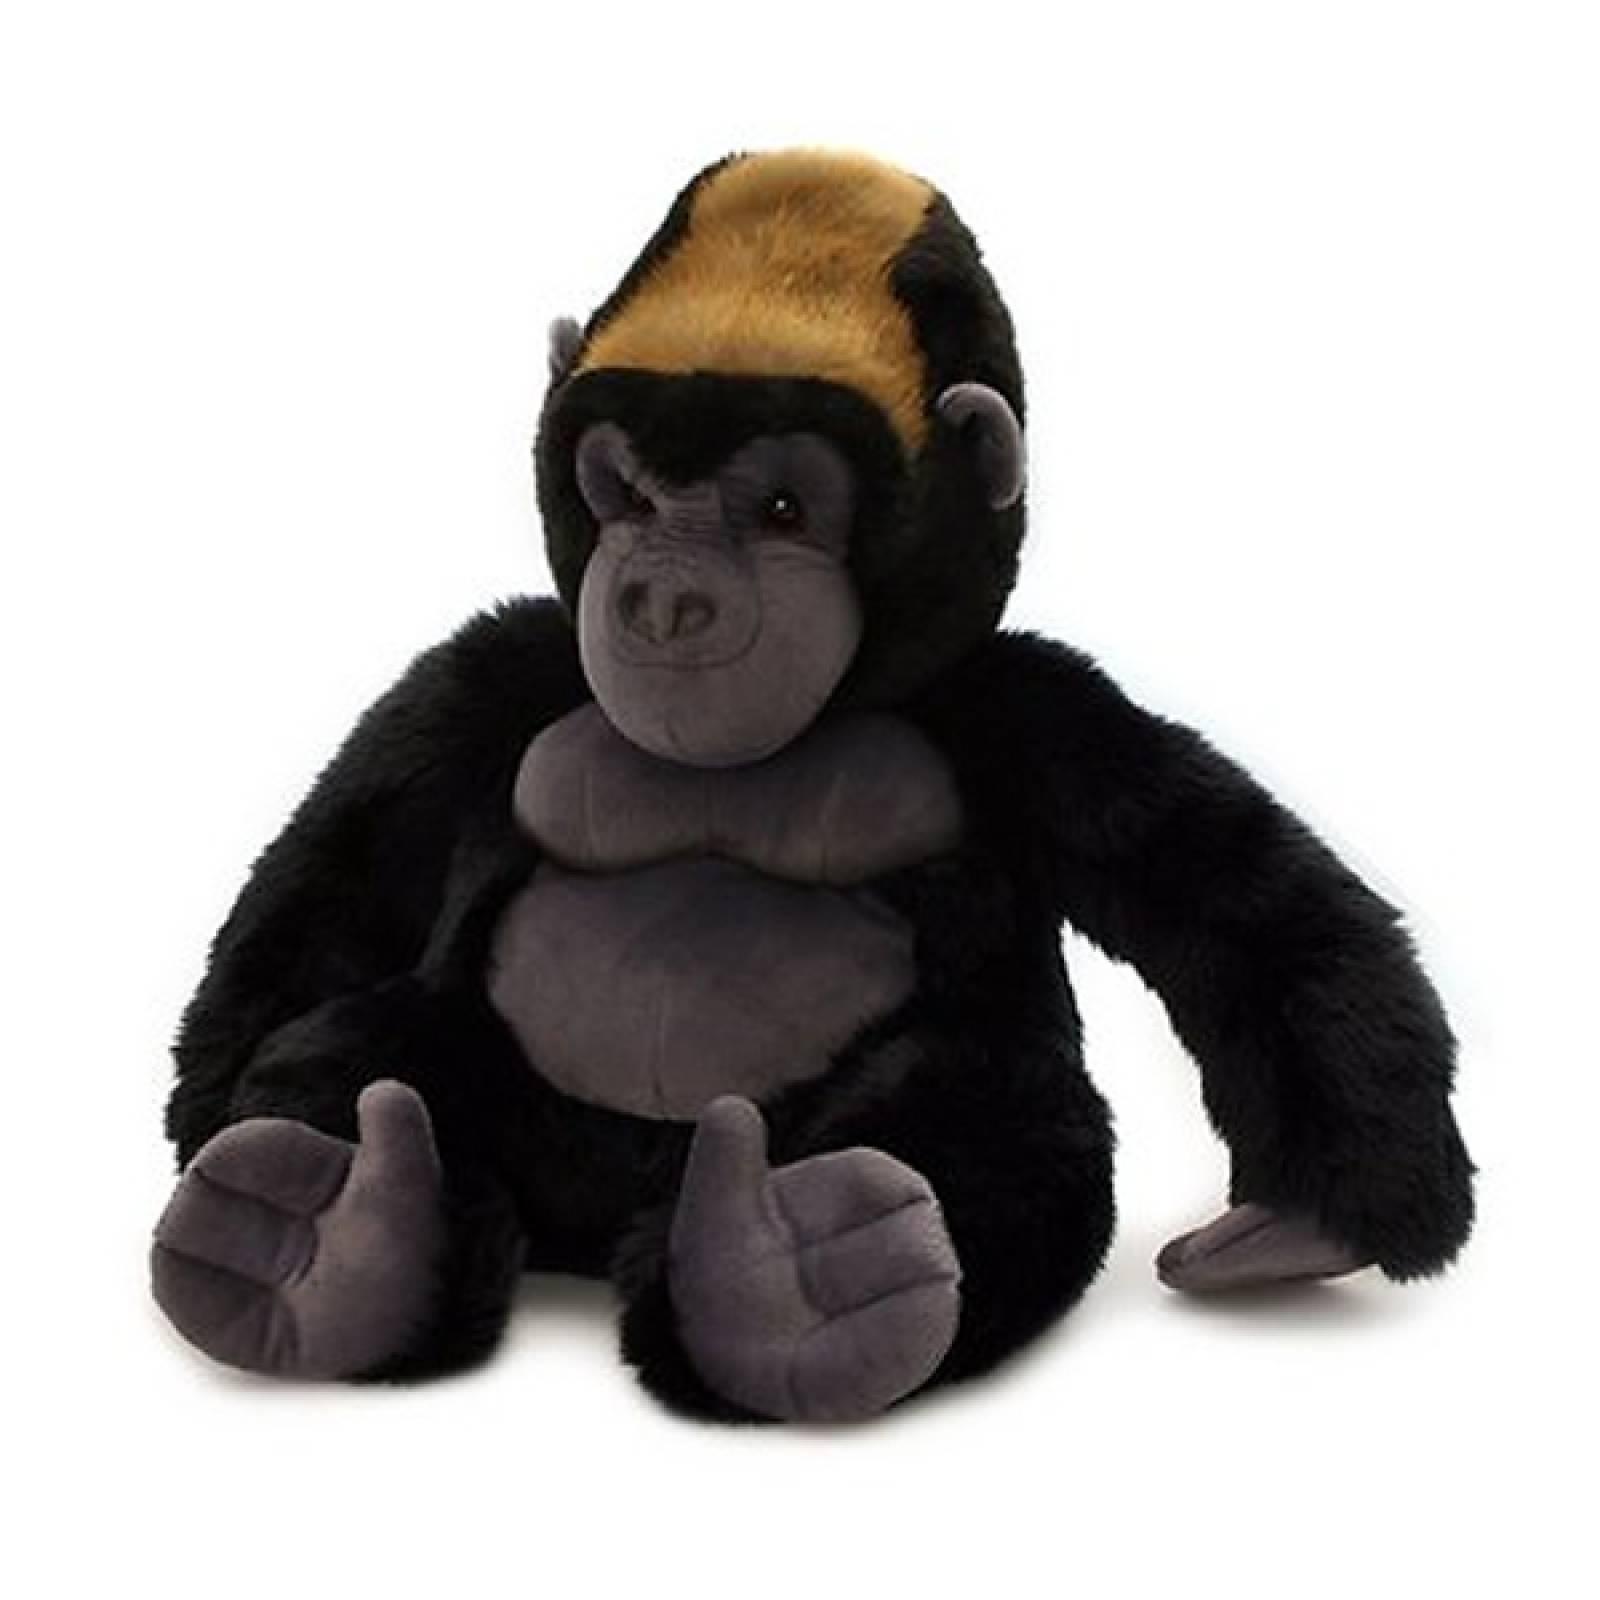 Sitting Gorilla Silverback Soft Toy 45cm